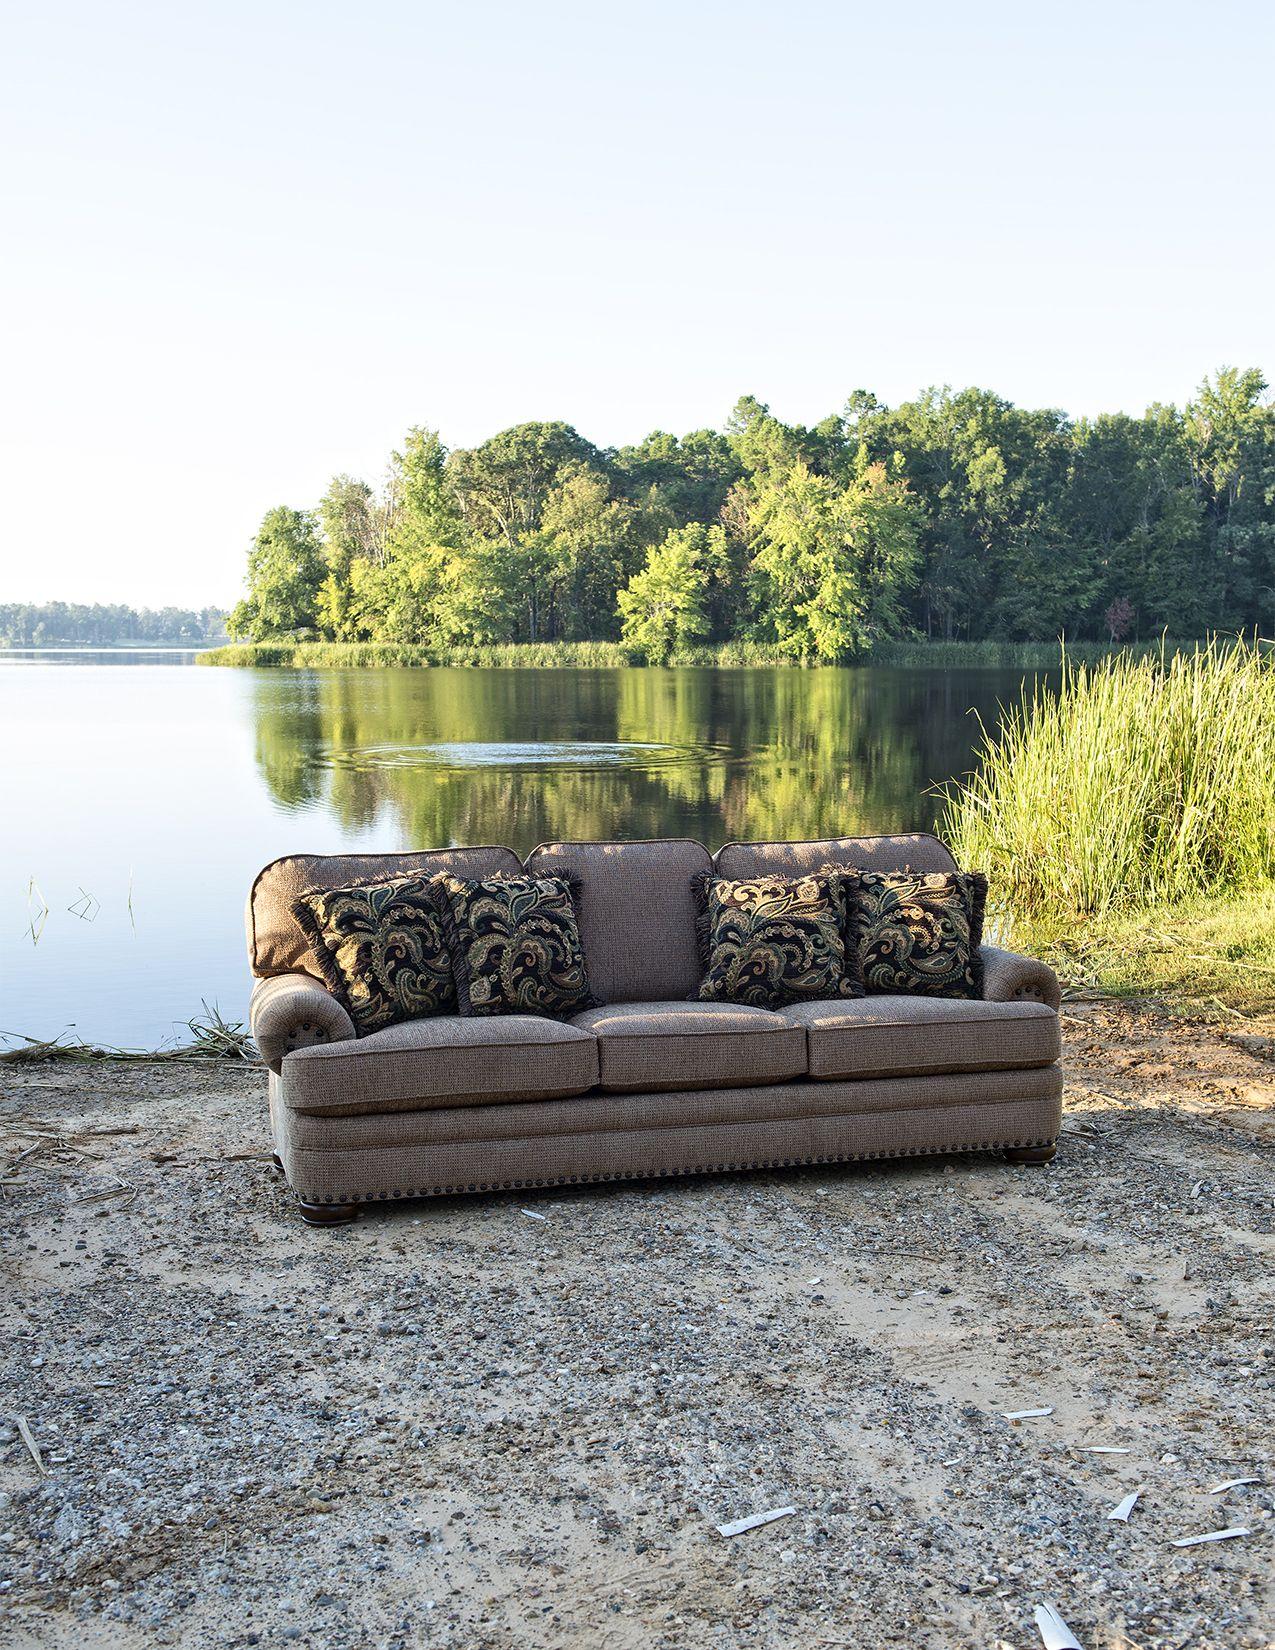 Mayo Furniture 3620 Fabric Sofa Knickknack Old Gold Carters